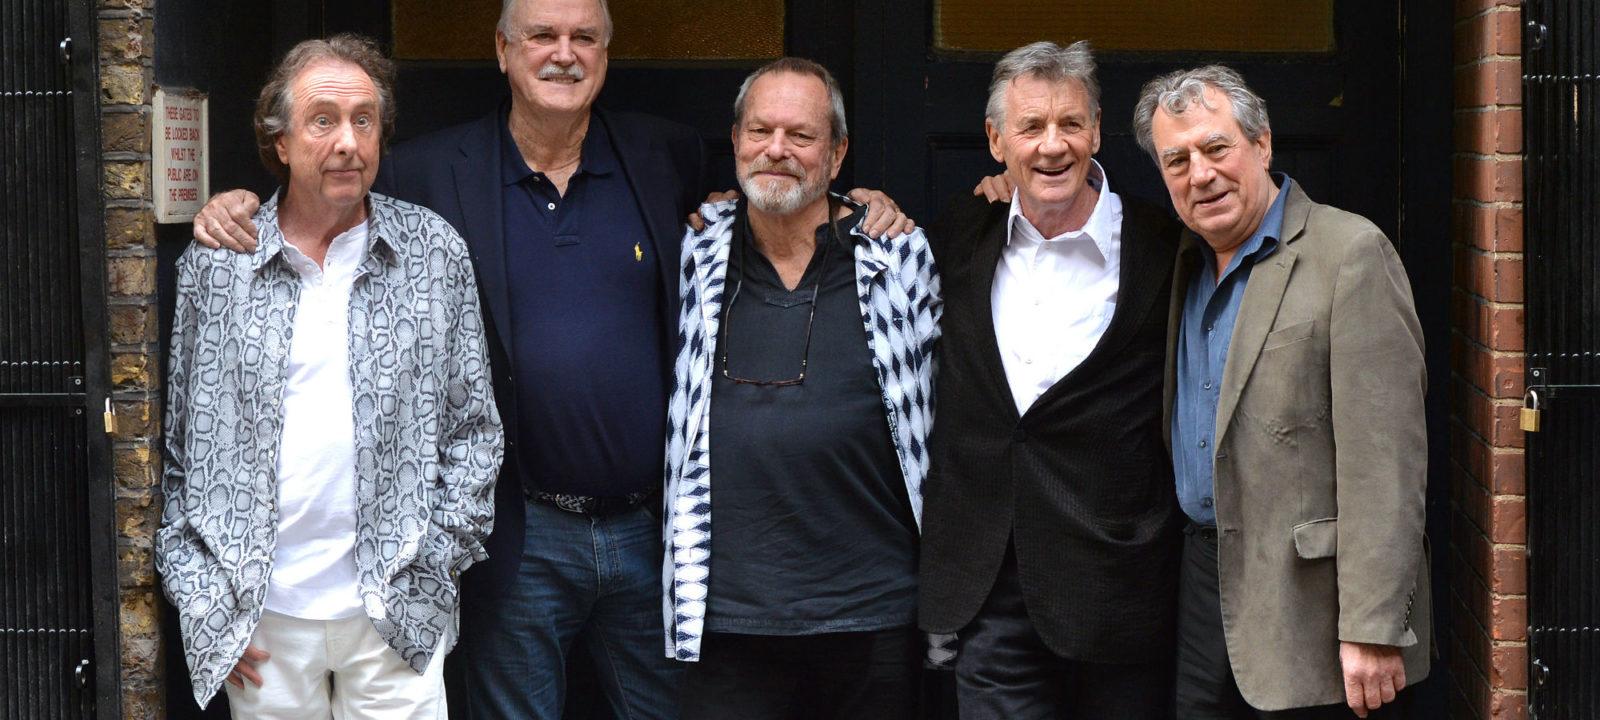 Monty Python 2